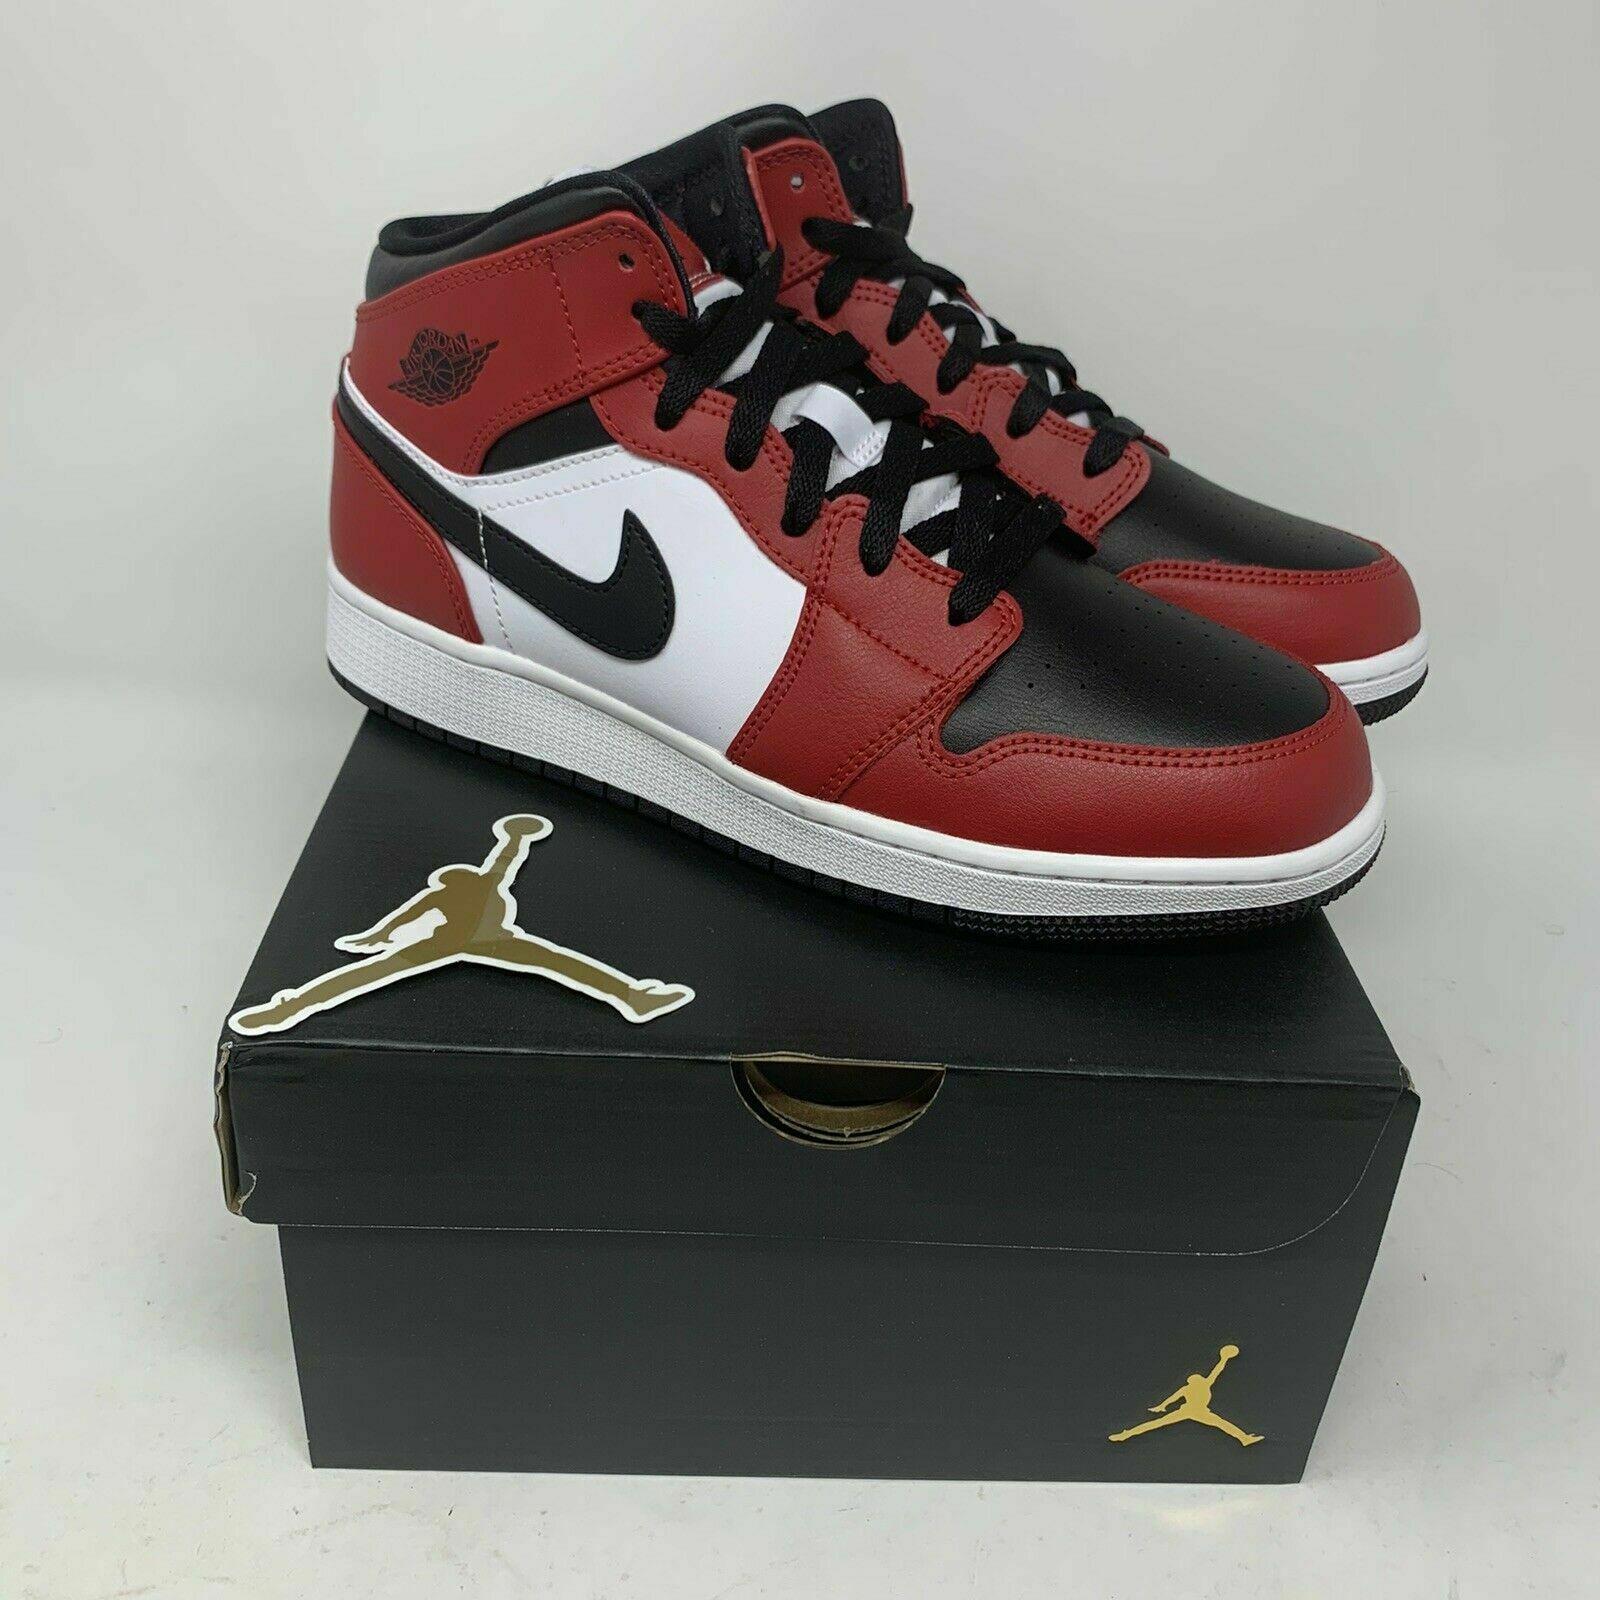 Jordan 1 Mid Chicago Black Toe GS